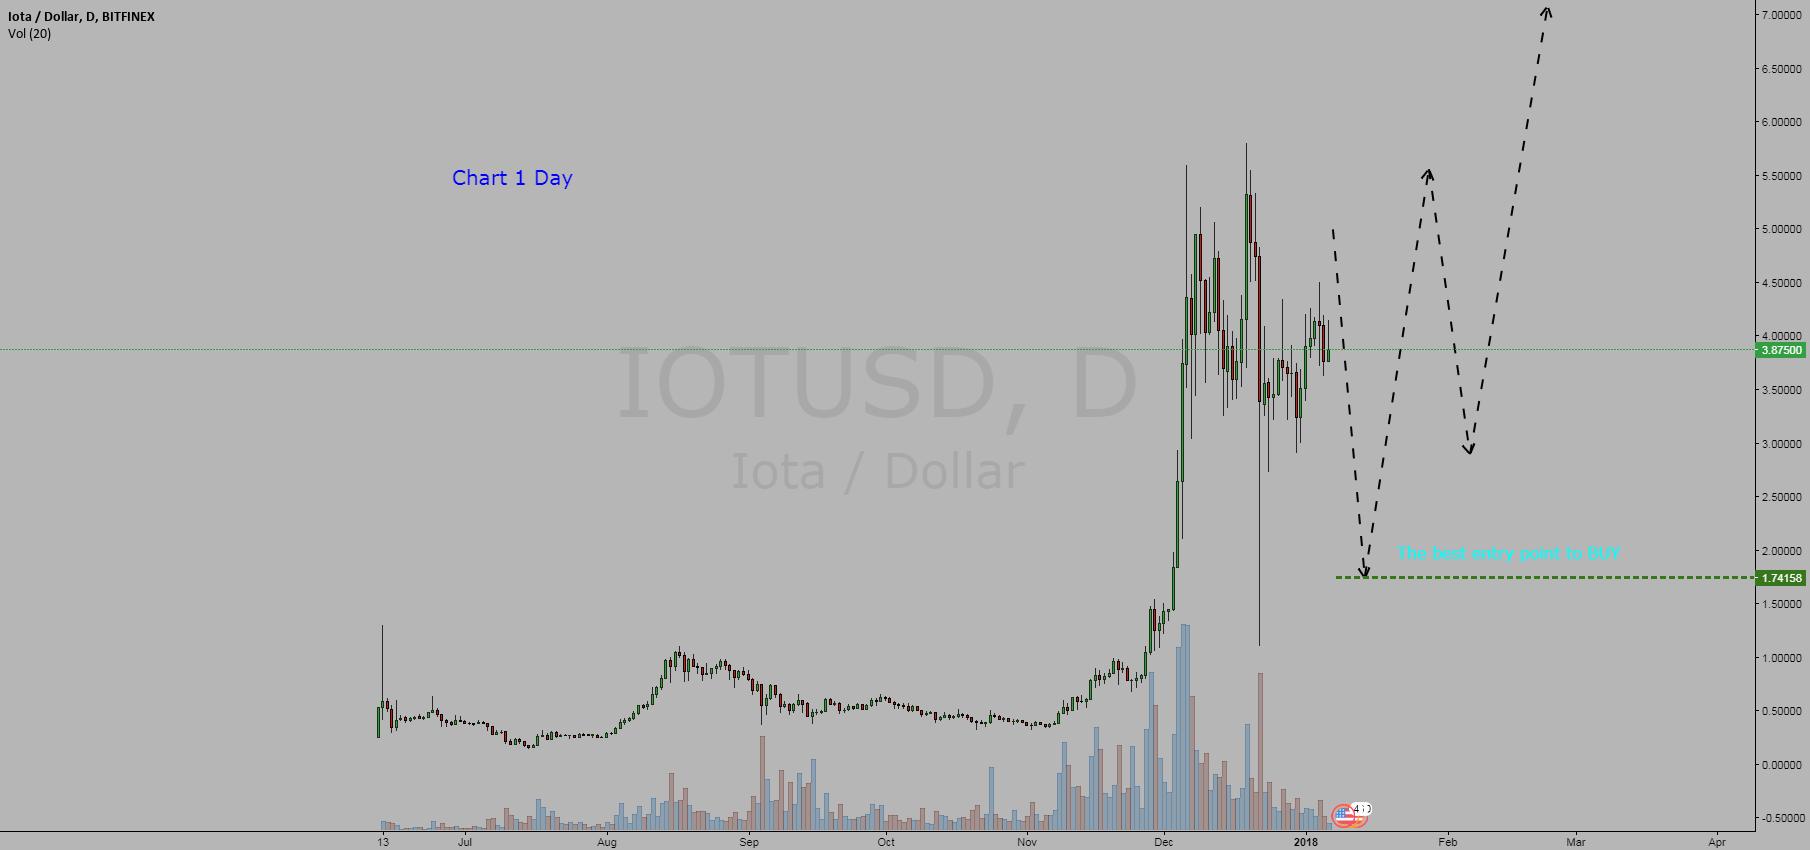 Cryptocurrency Iota / Dollar = BUY